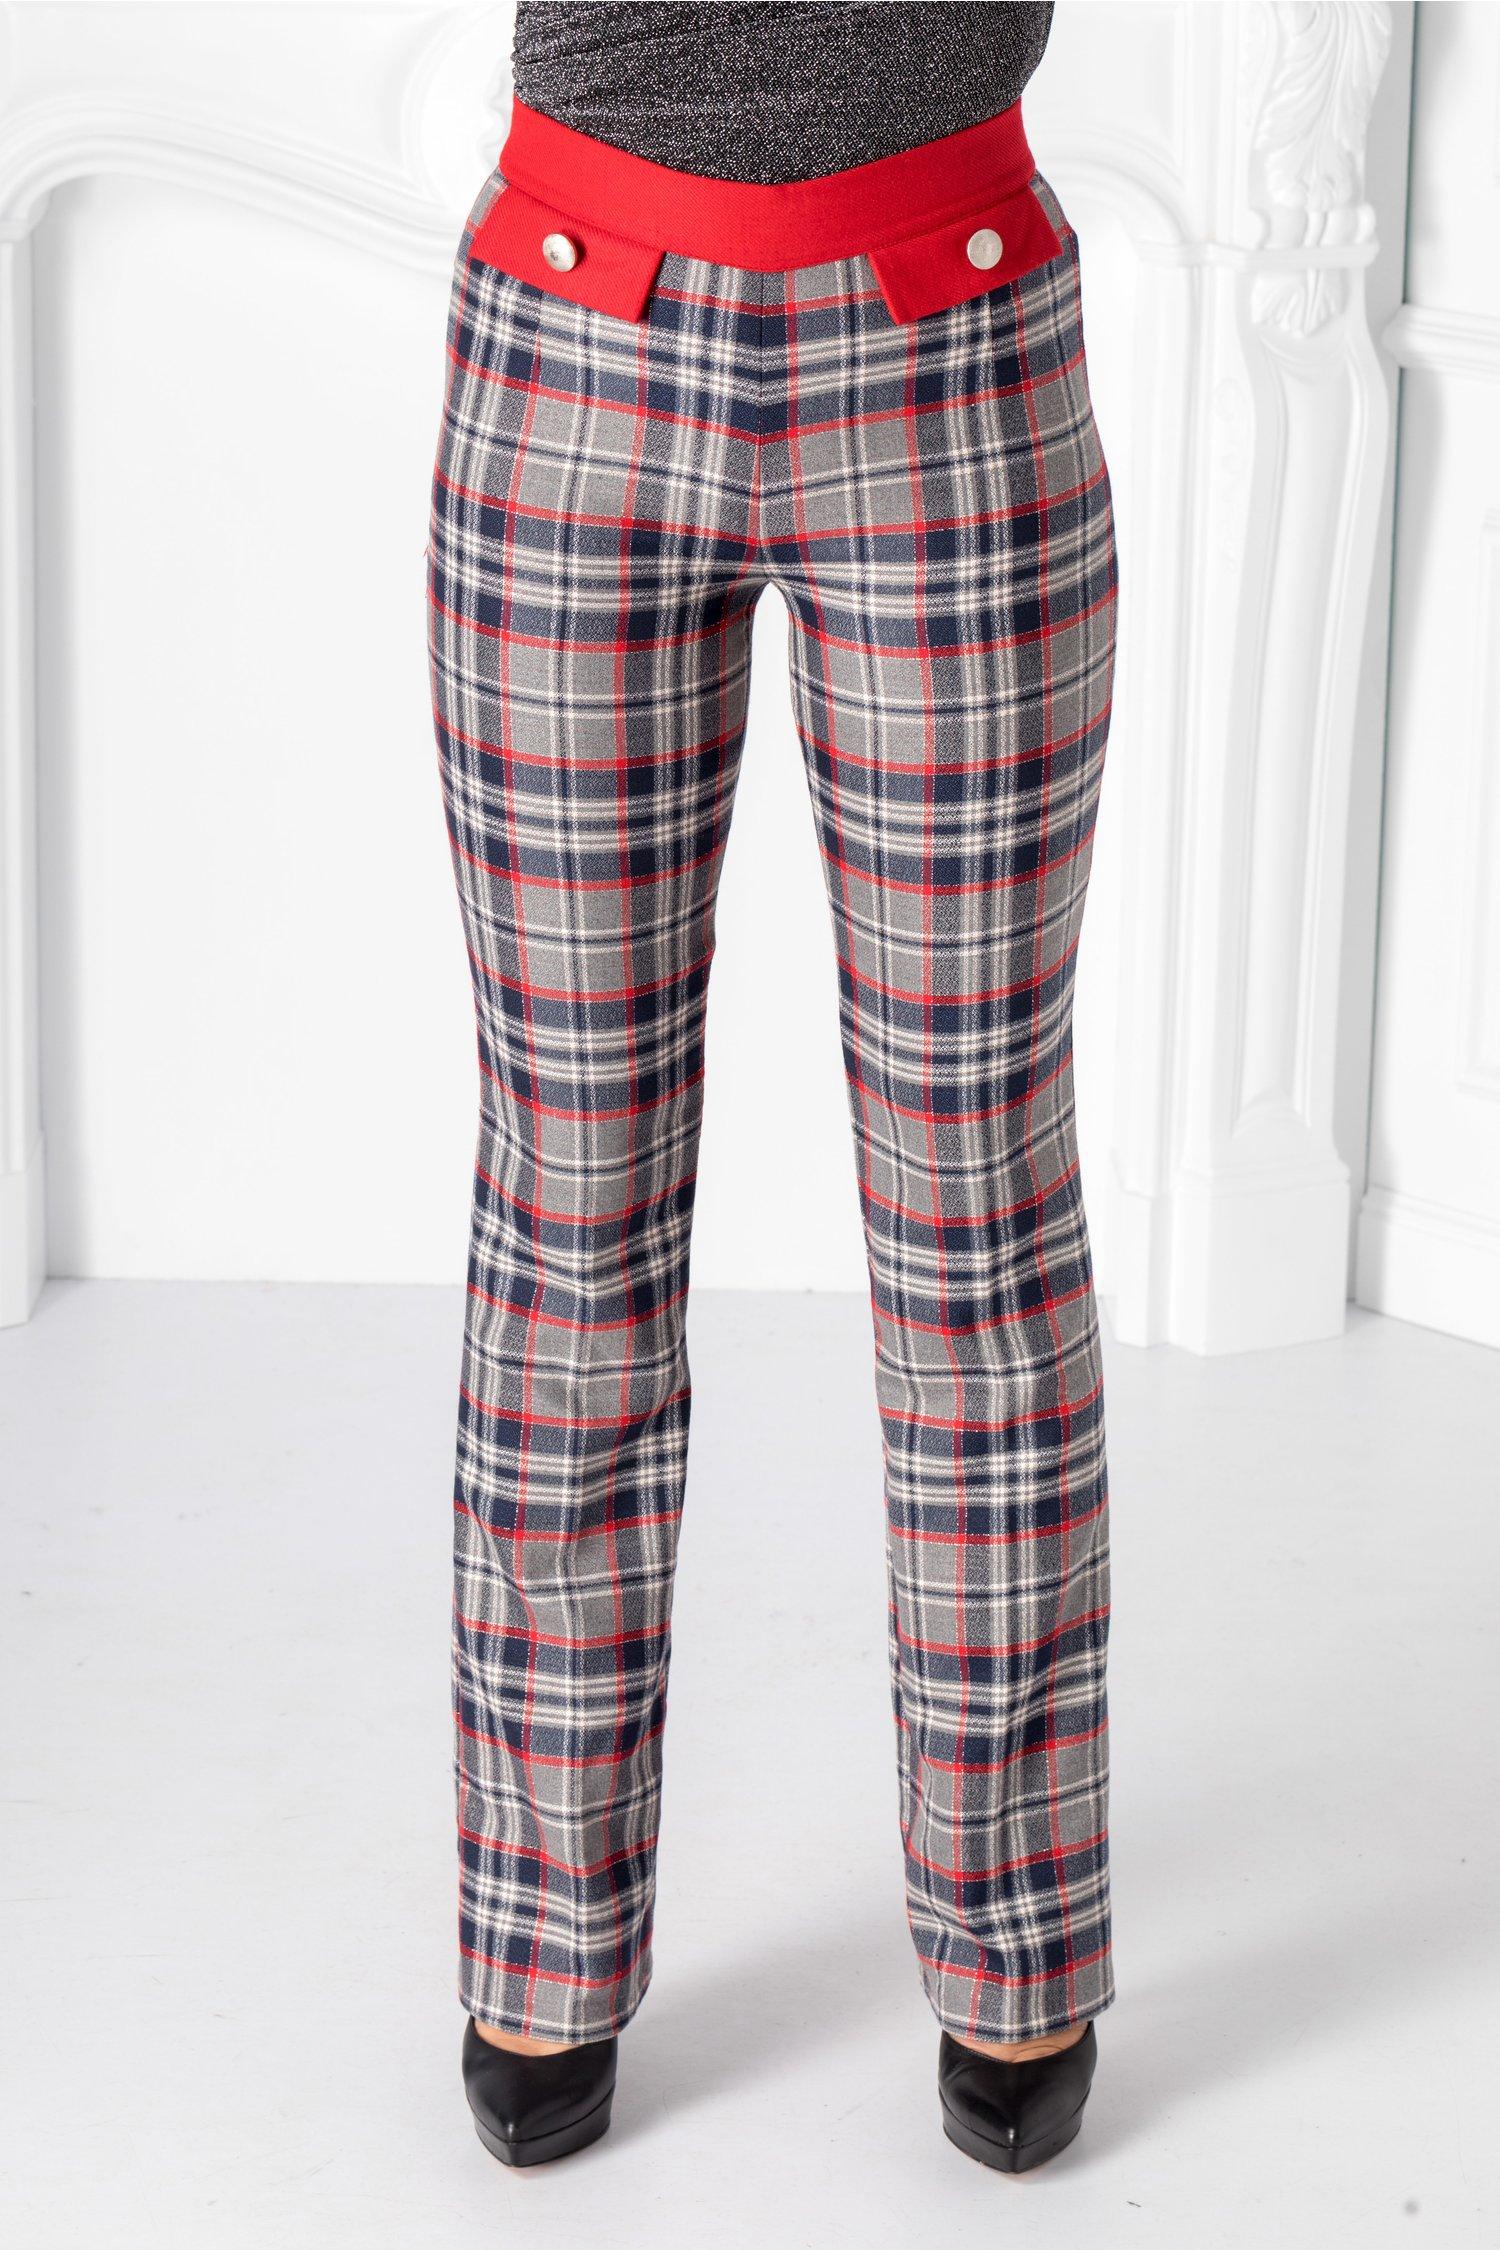 Pantaloni Pretty gri cu carouri rosii thumbnail